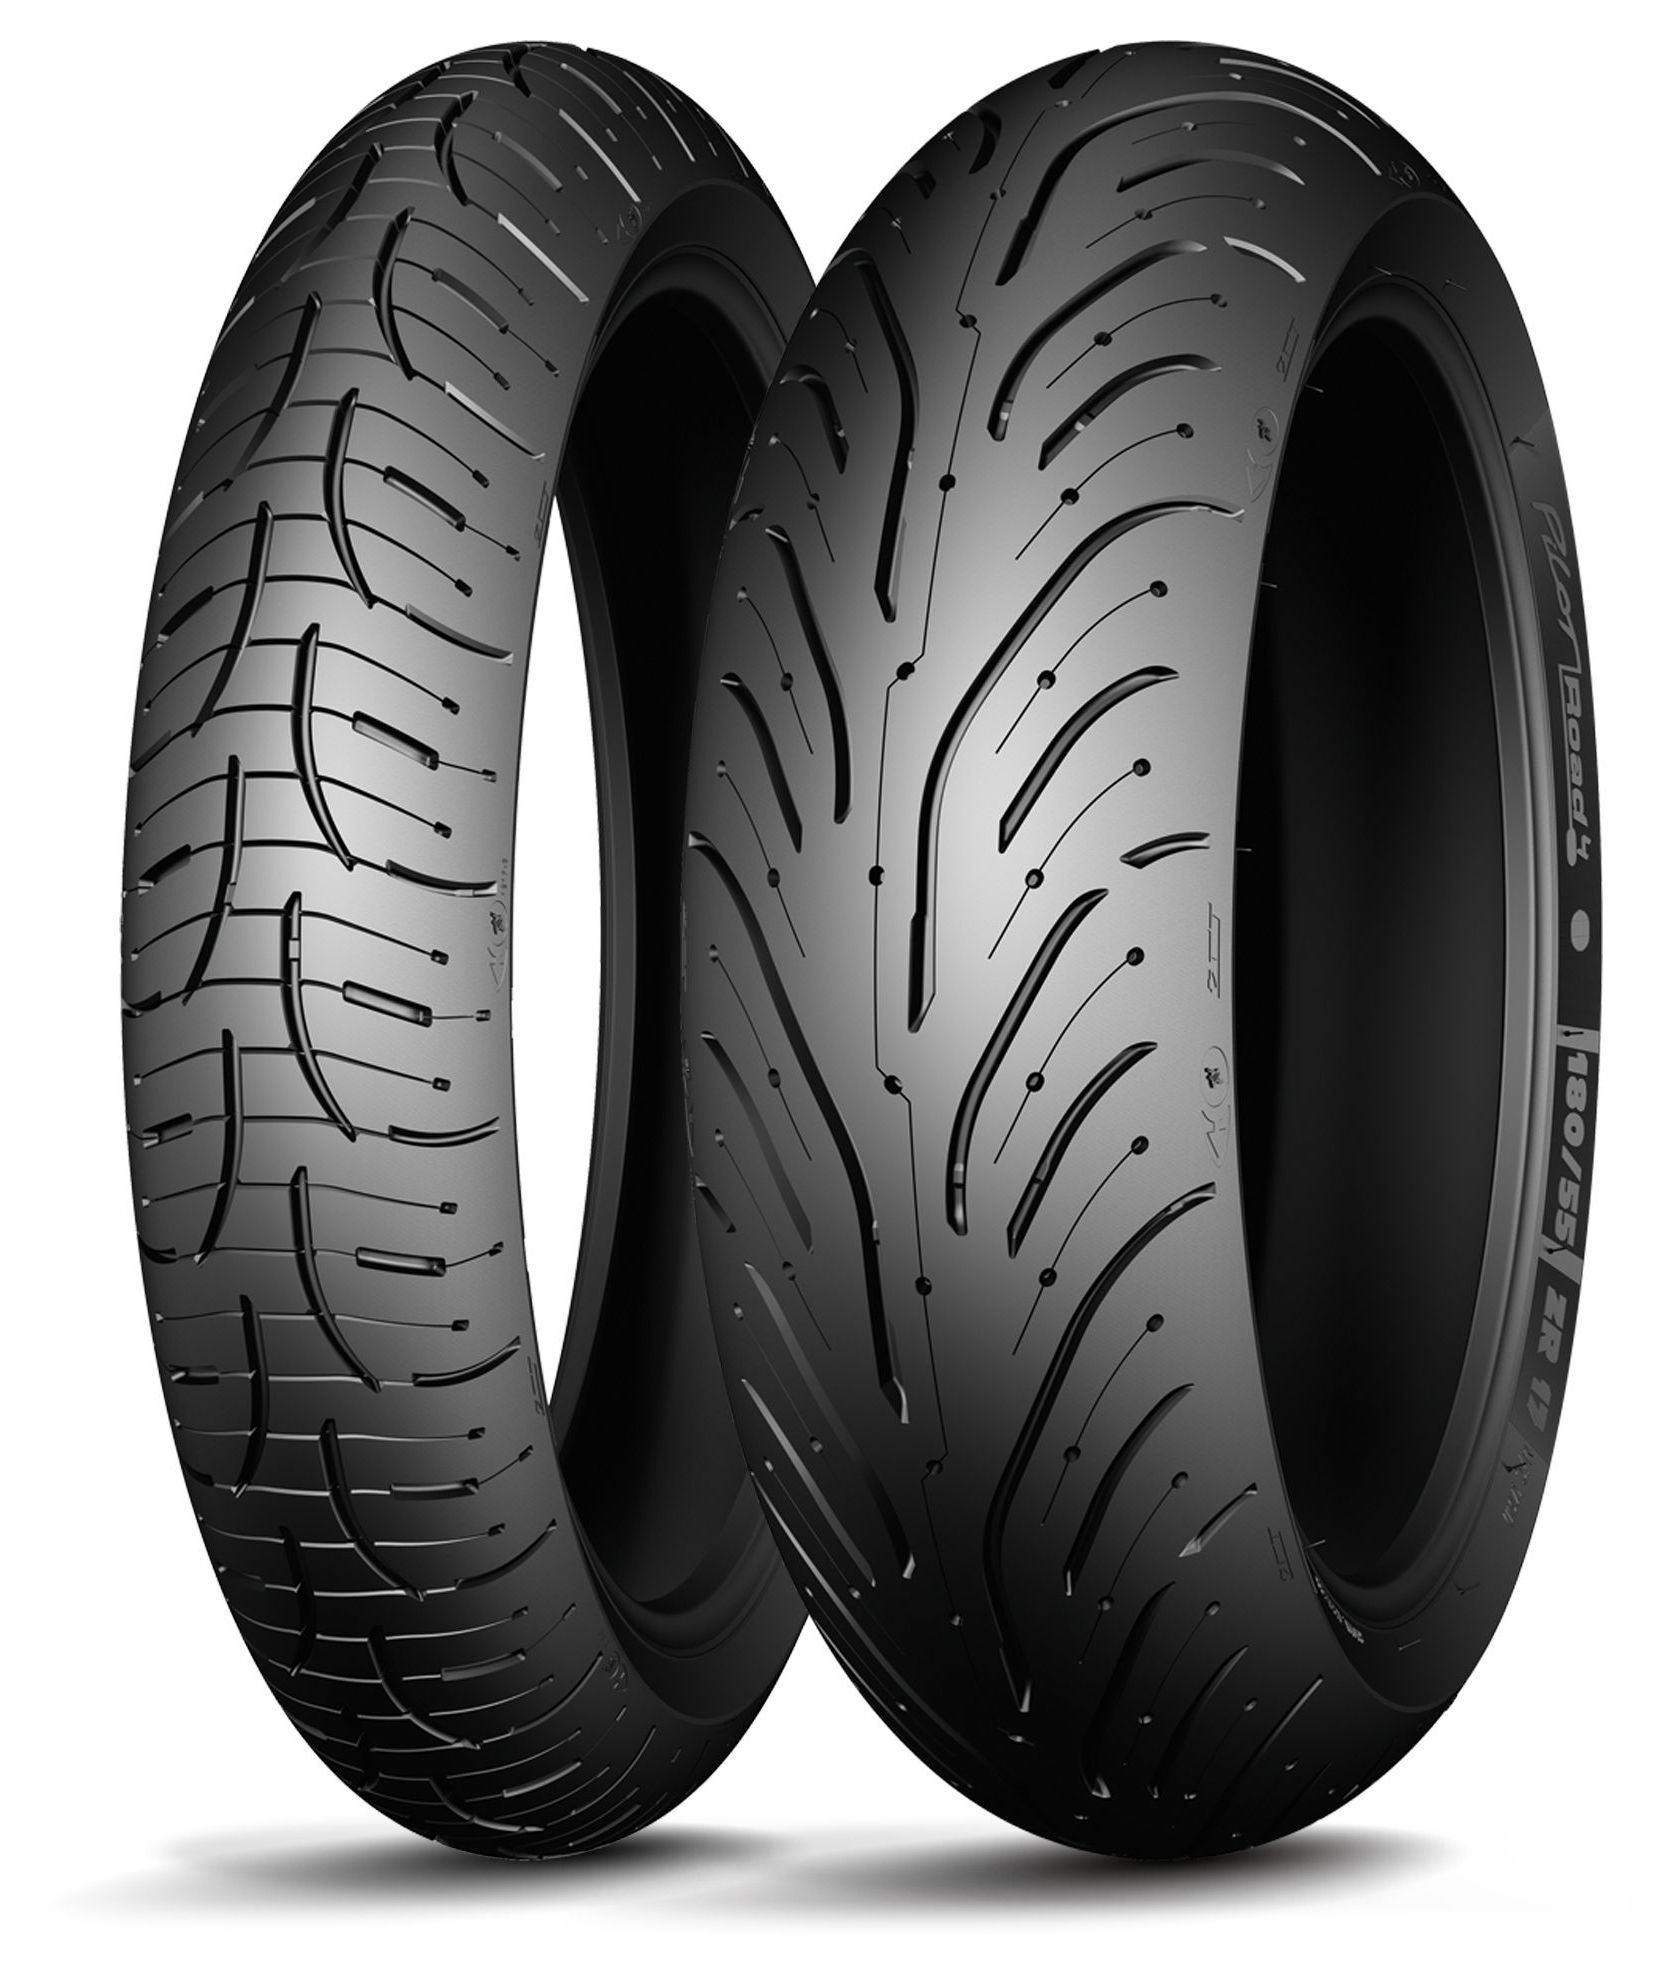 michelin pilot road 4 trail tires revzilla. Black Bedroom Furniture Sets. Home Design Ideas